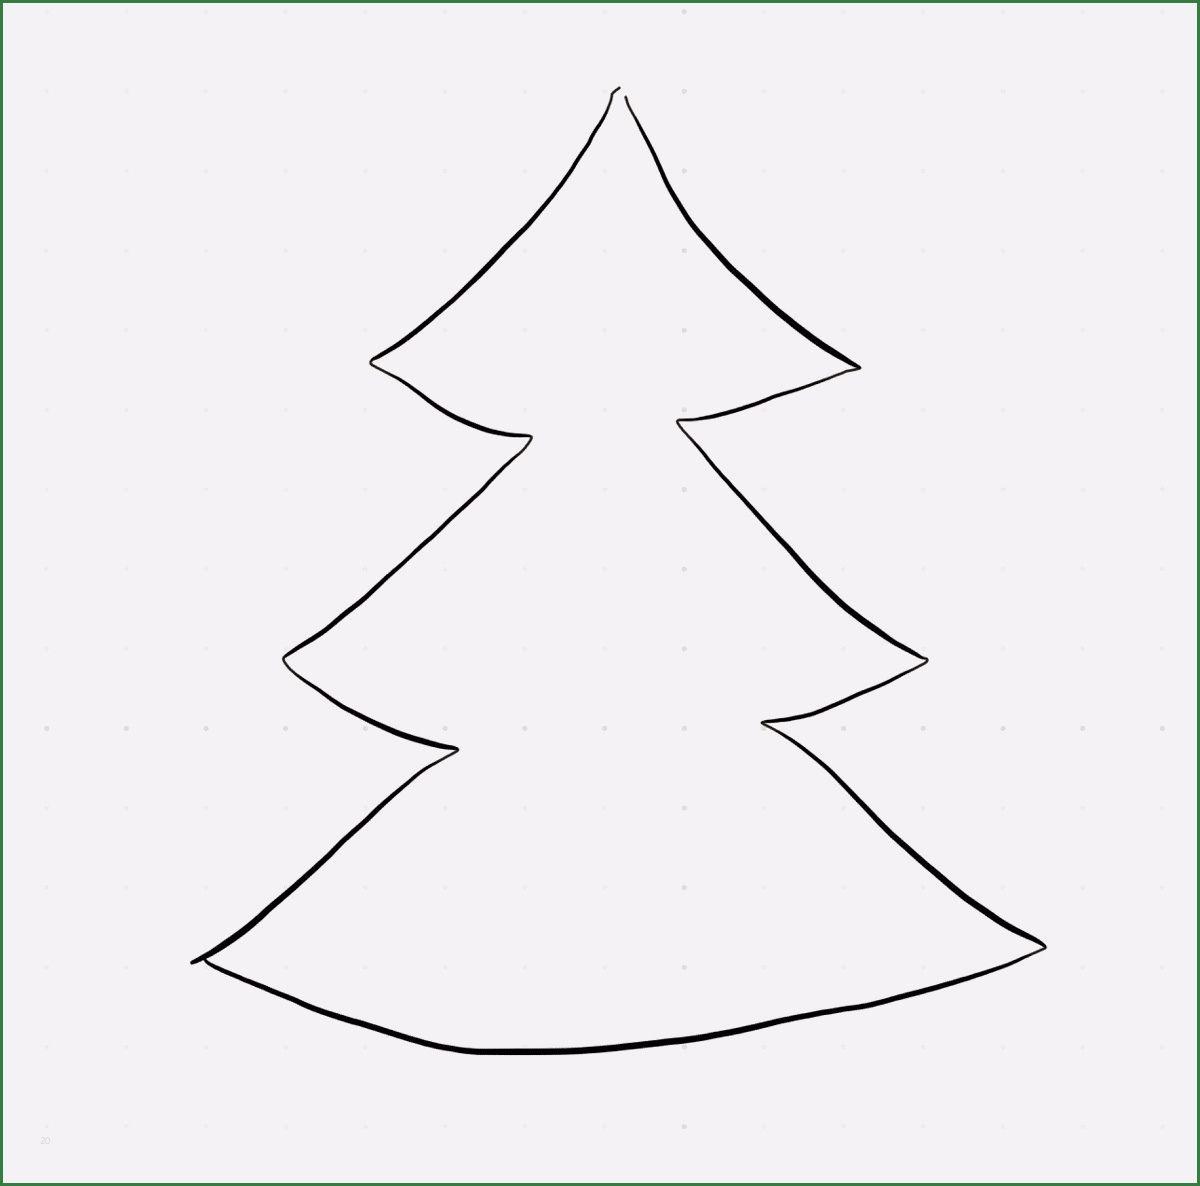 Weihnachtsbaum Vorlage Weihnachtsbaum Vorlage 11